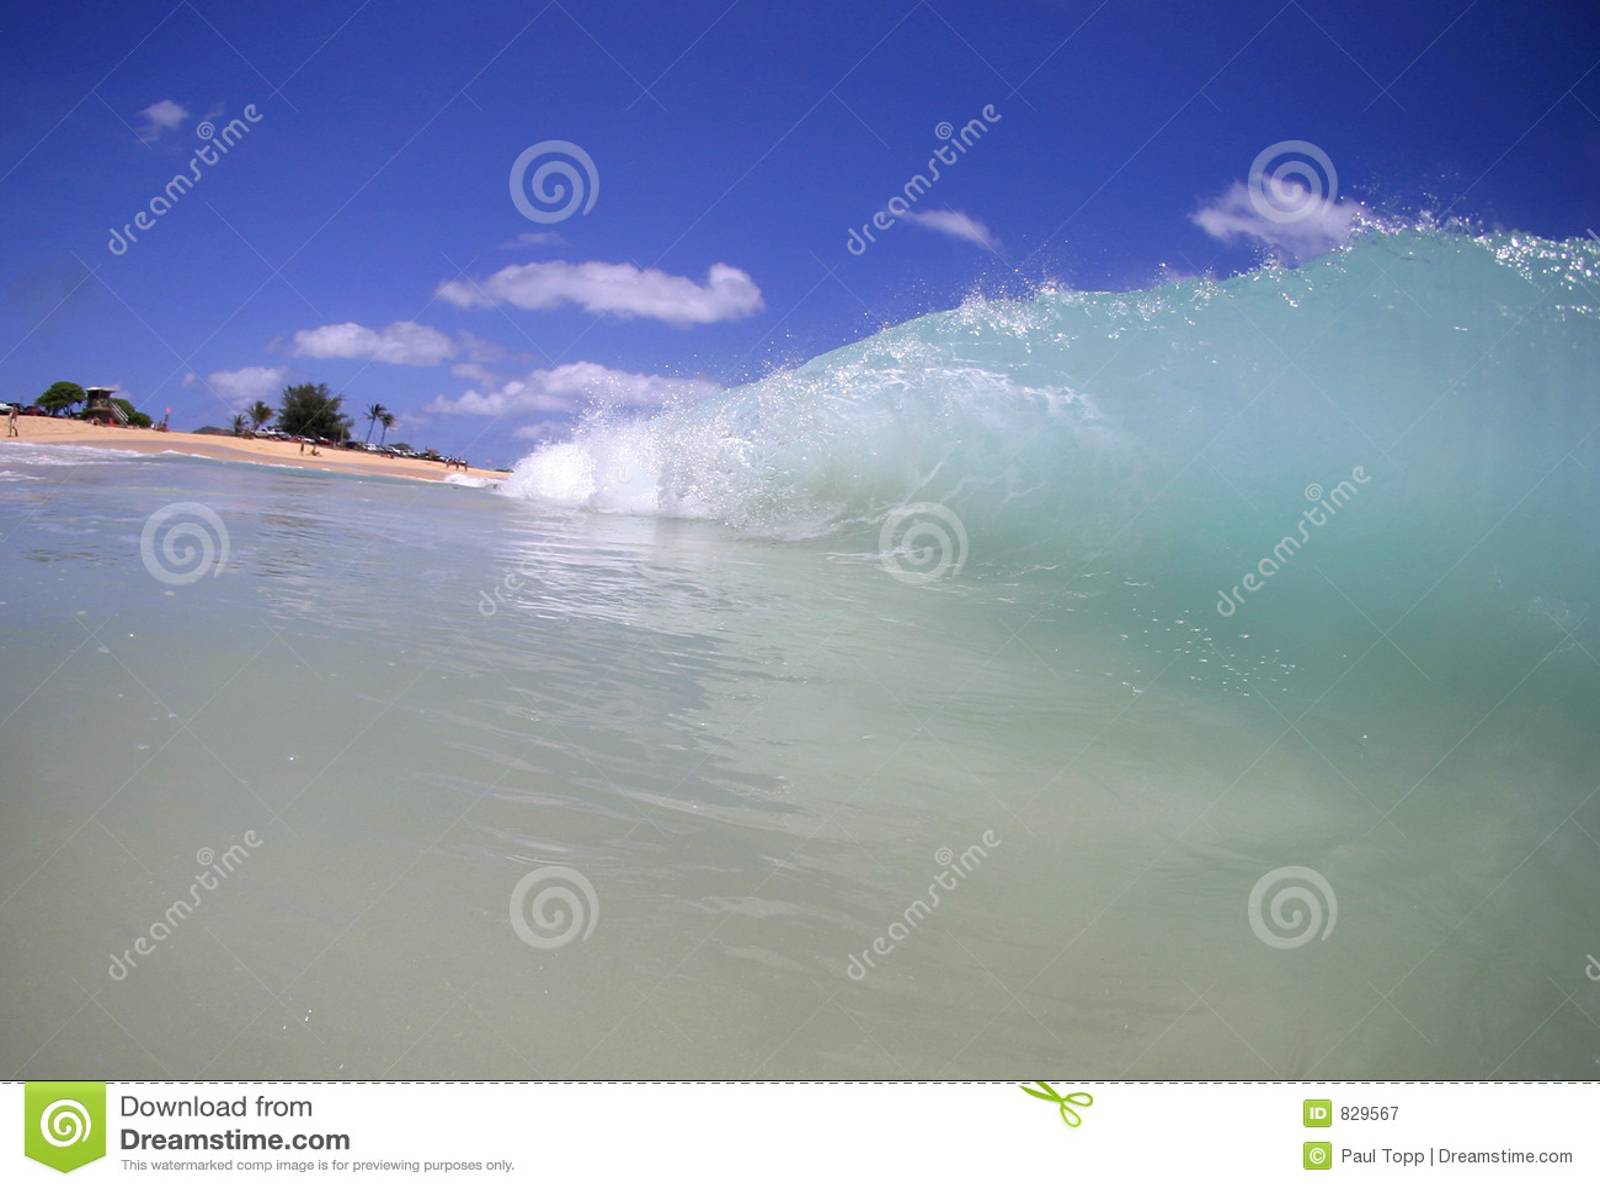 Crashing Wave on the Beach in Hawaii